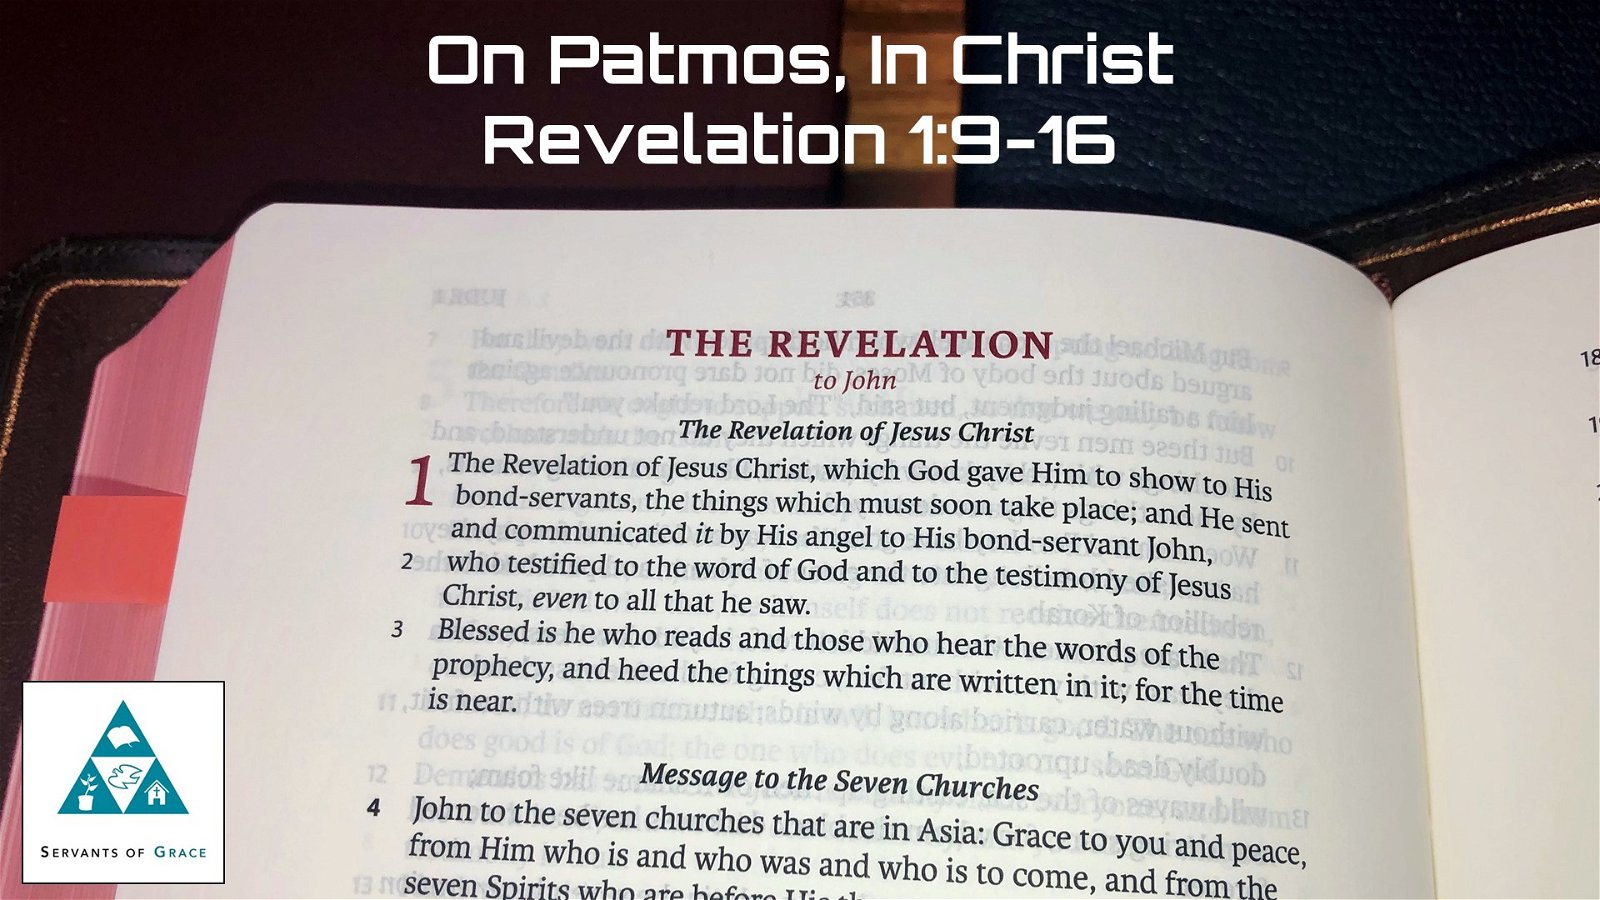 #6: On Patmos, in Christ[Sermon] 1